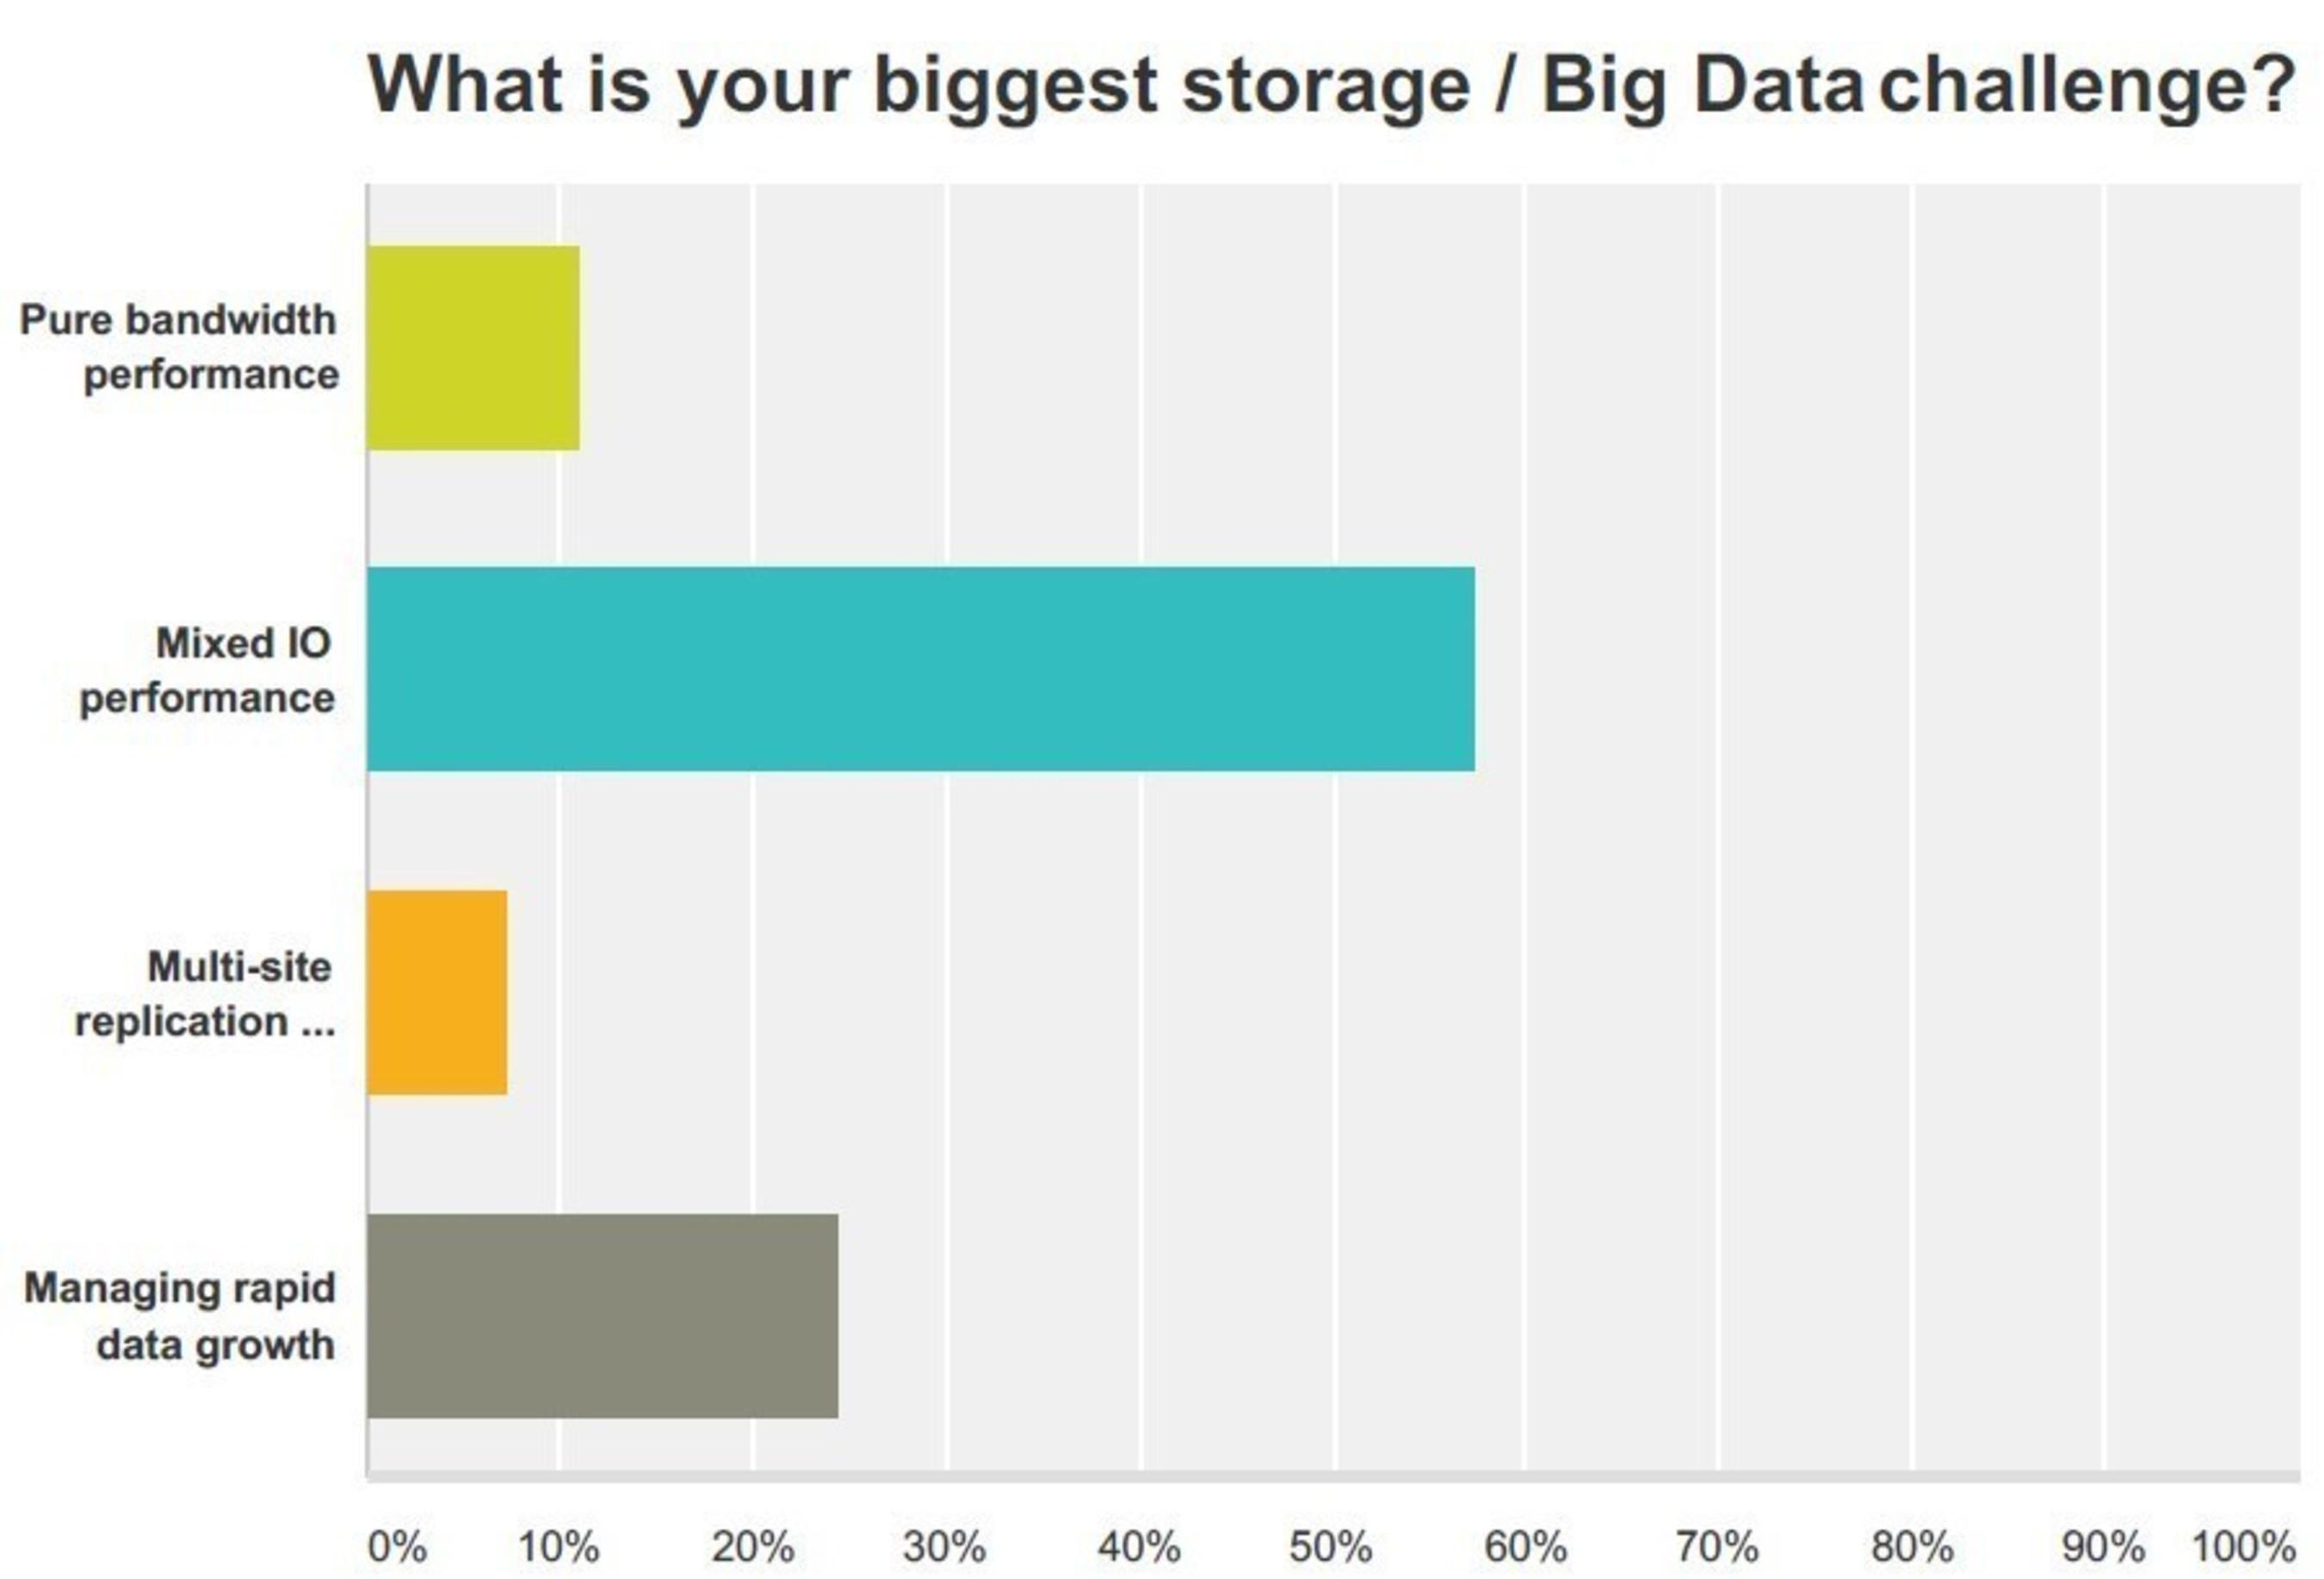 What is your biggest storage/Big Data challenge?